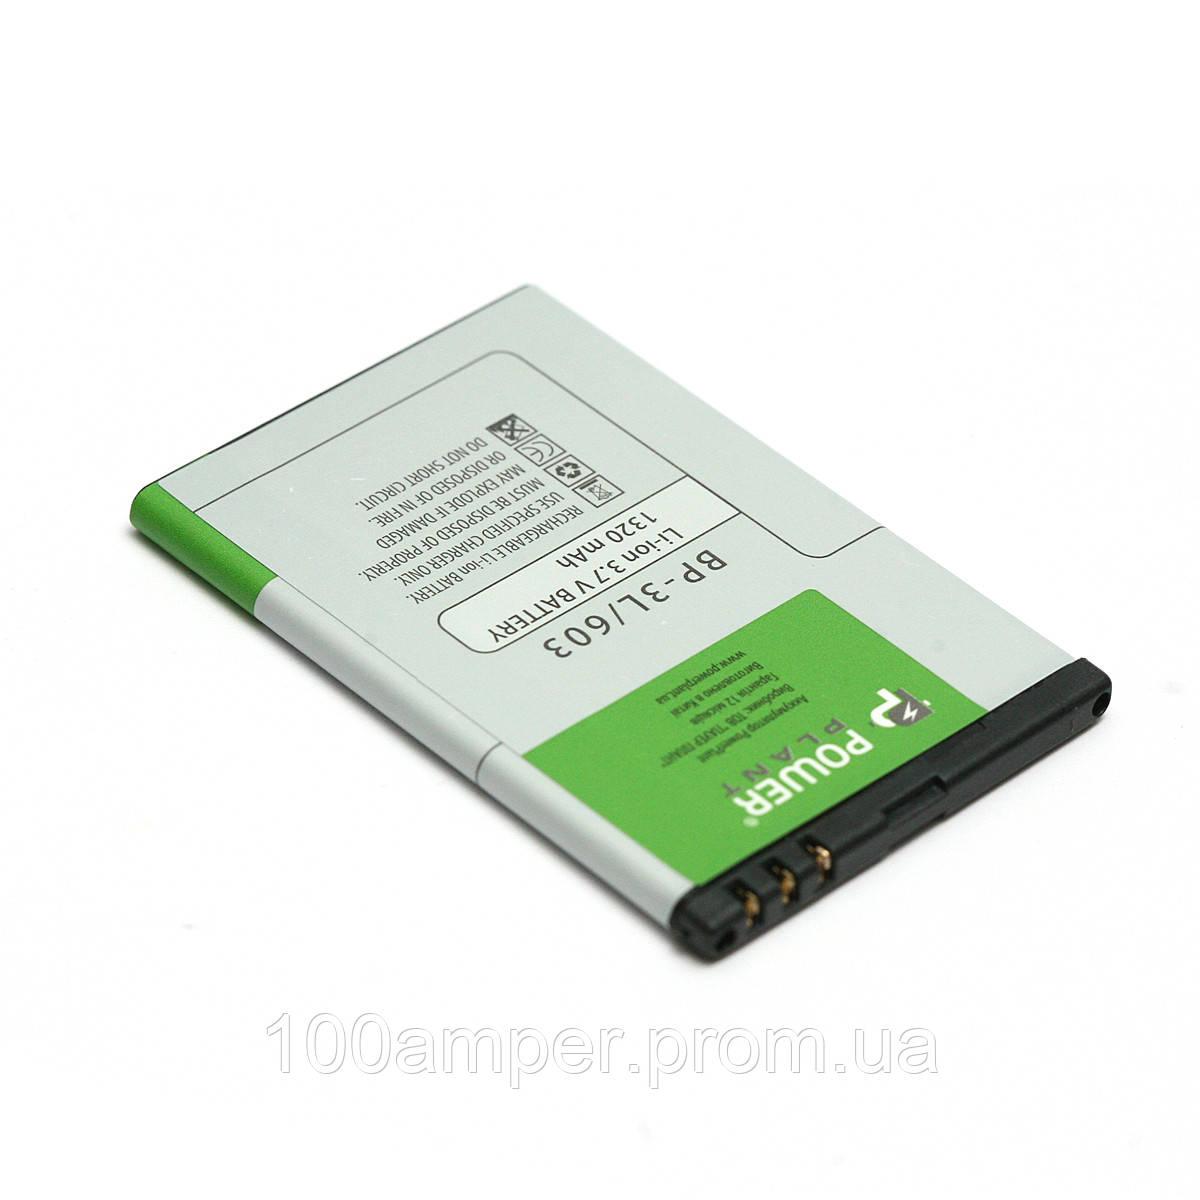 Аккумулятор PowerPlant Nokia 603, 710 (BP-3L) 1320mAh